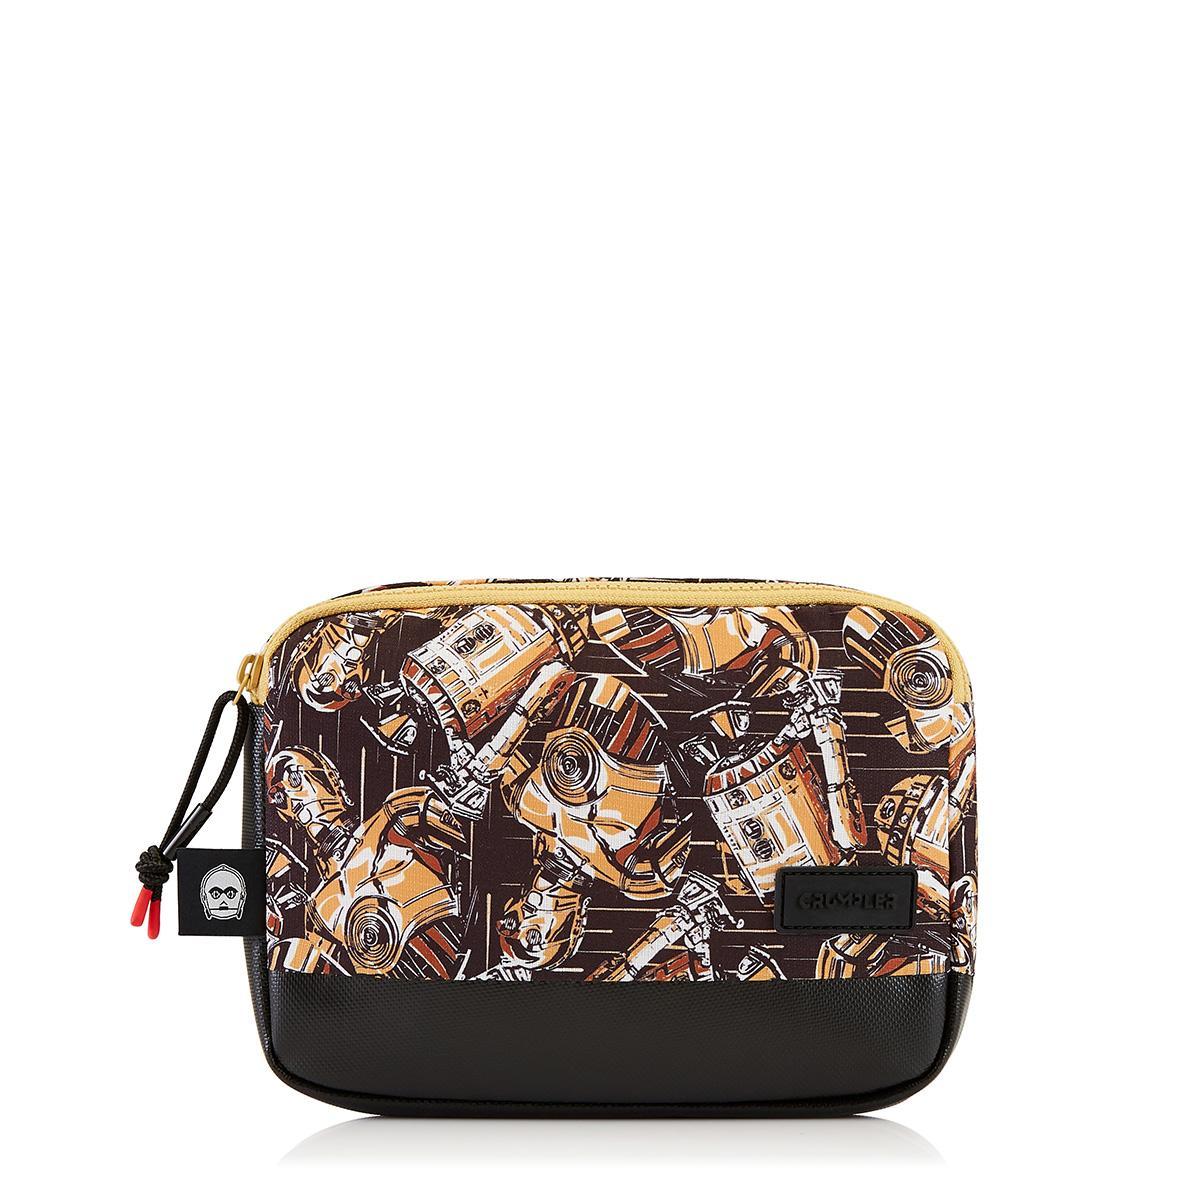 Crumpler X Star Wars - Mini Crony 11 Laptop Case By Crumpler (capitaland Merchant).